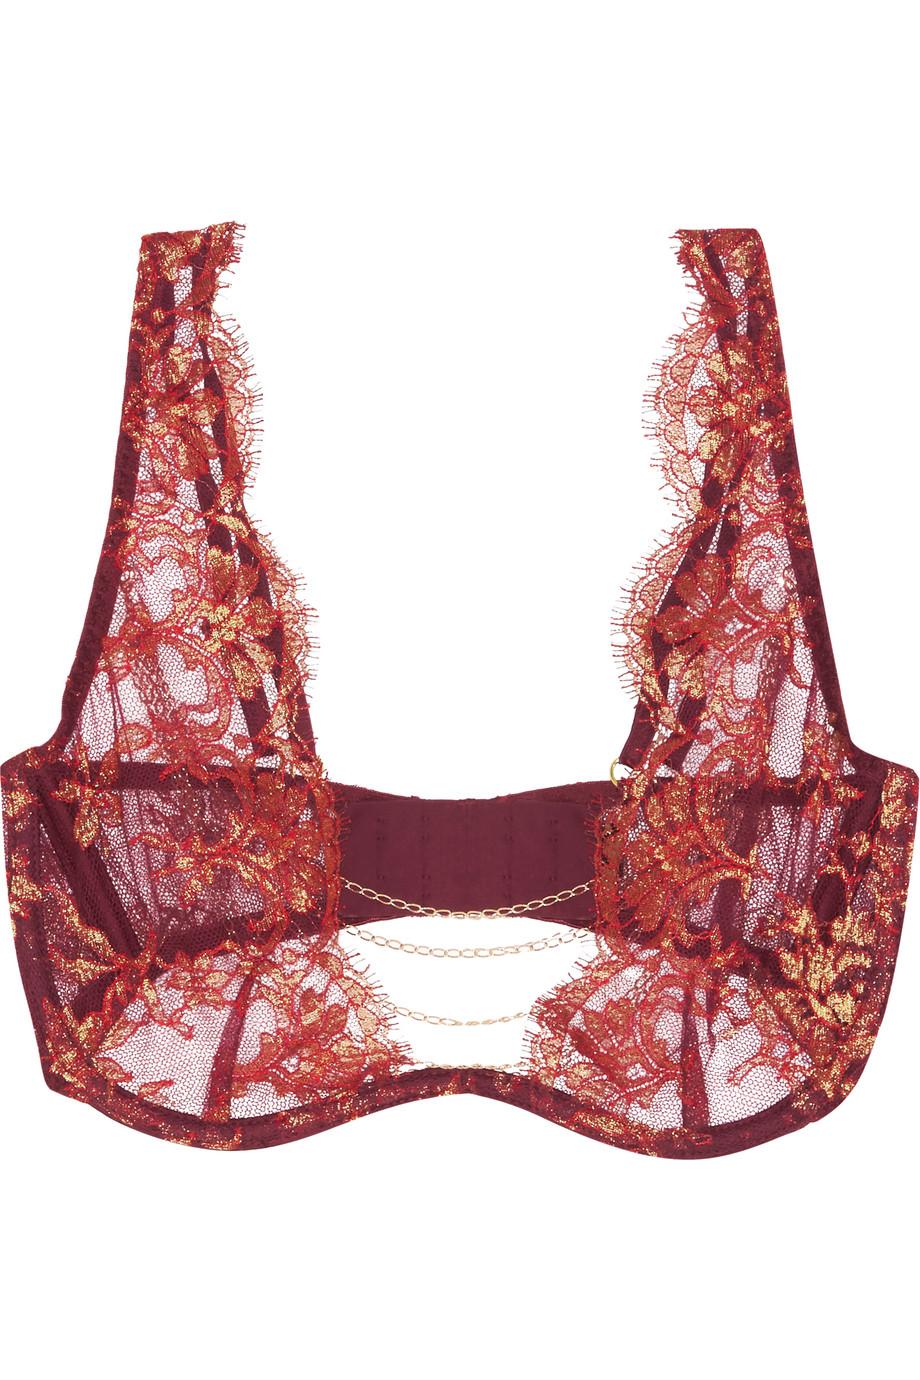 Agent Provocateur Soirée Inka Chain-Trimmed Metallic Leavers Lace Underwired Bra, Claret, Women's, Size: 32C